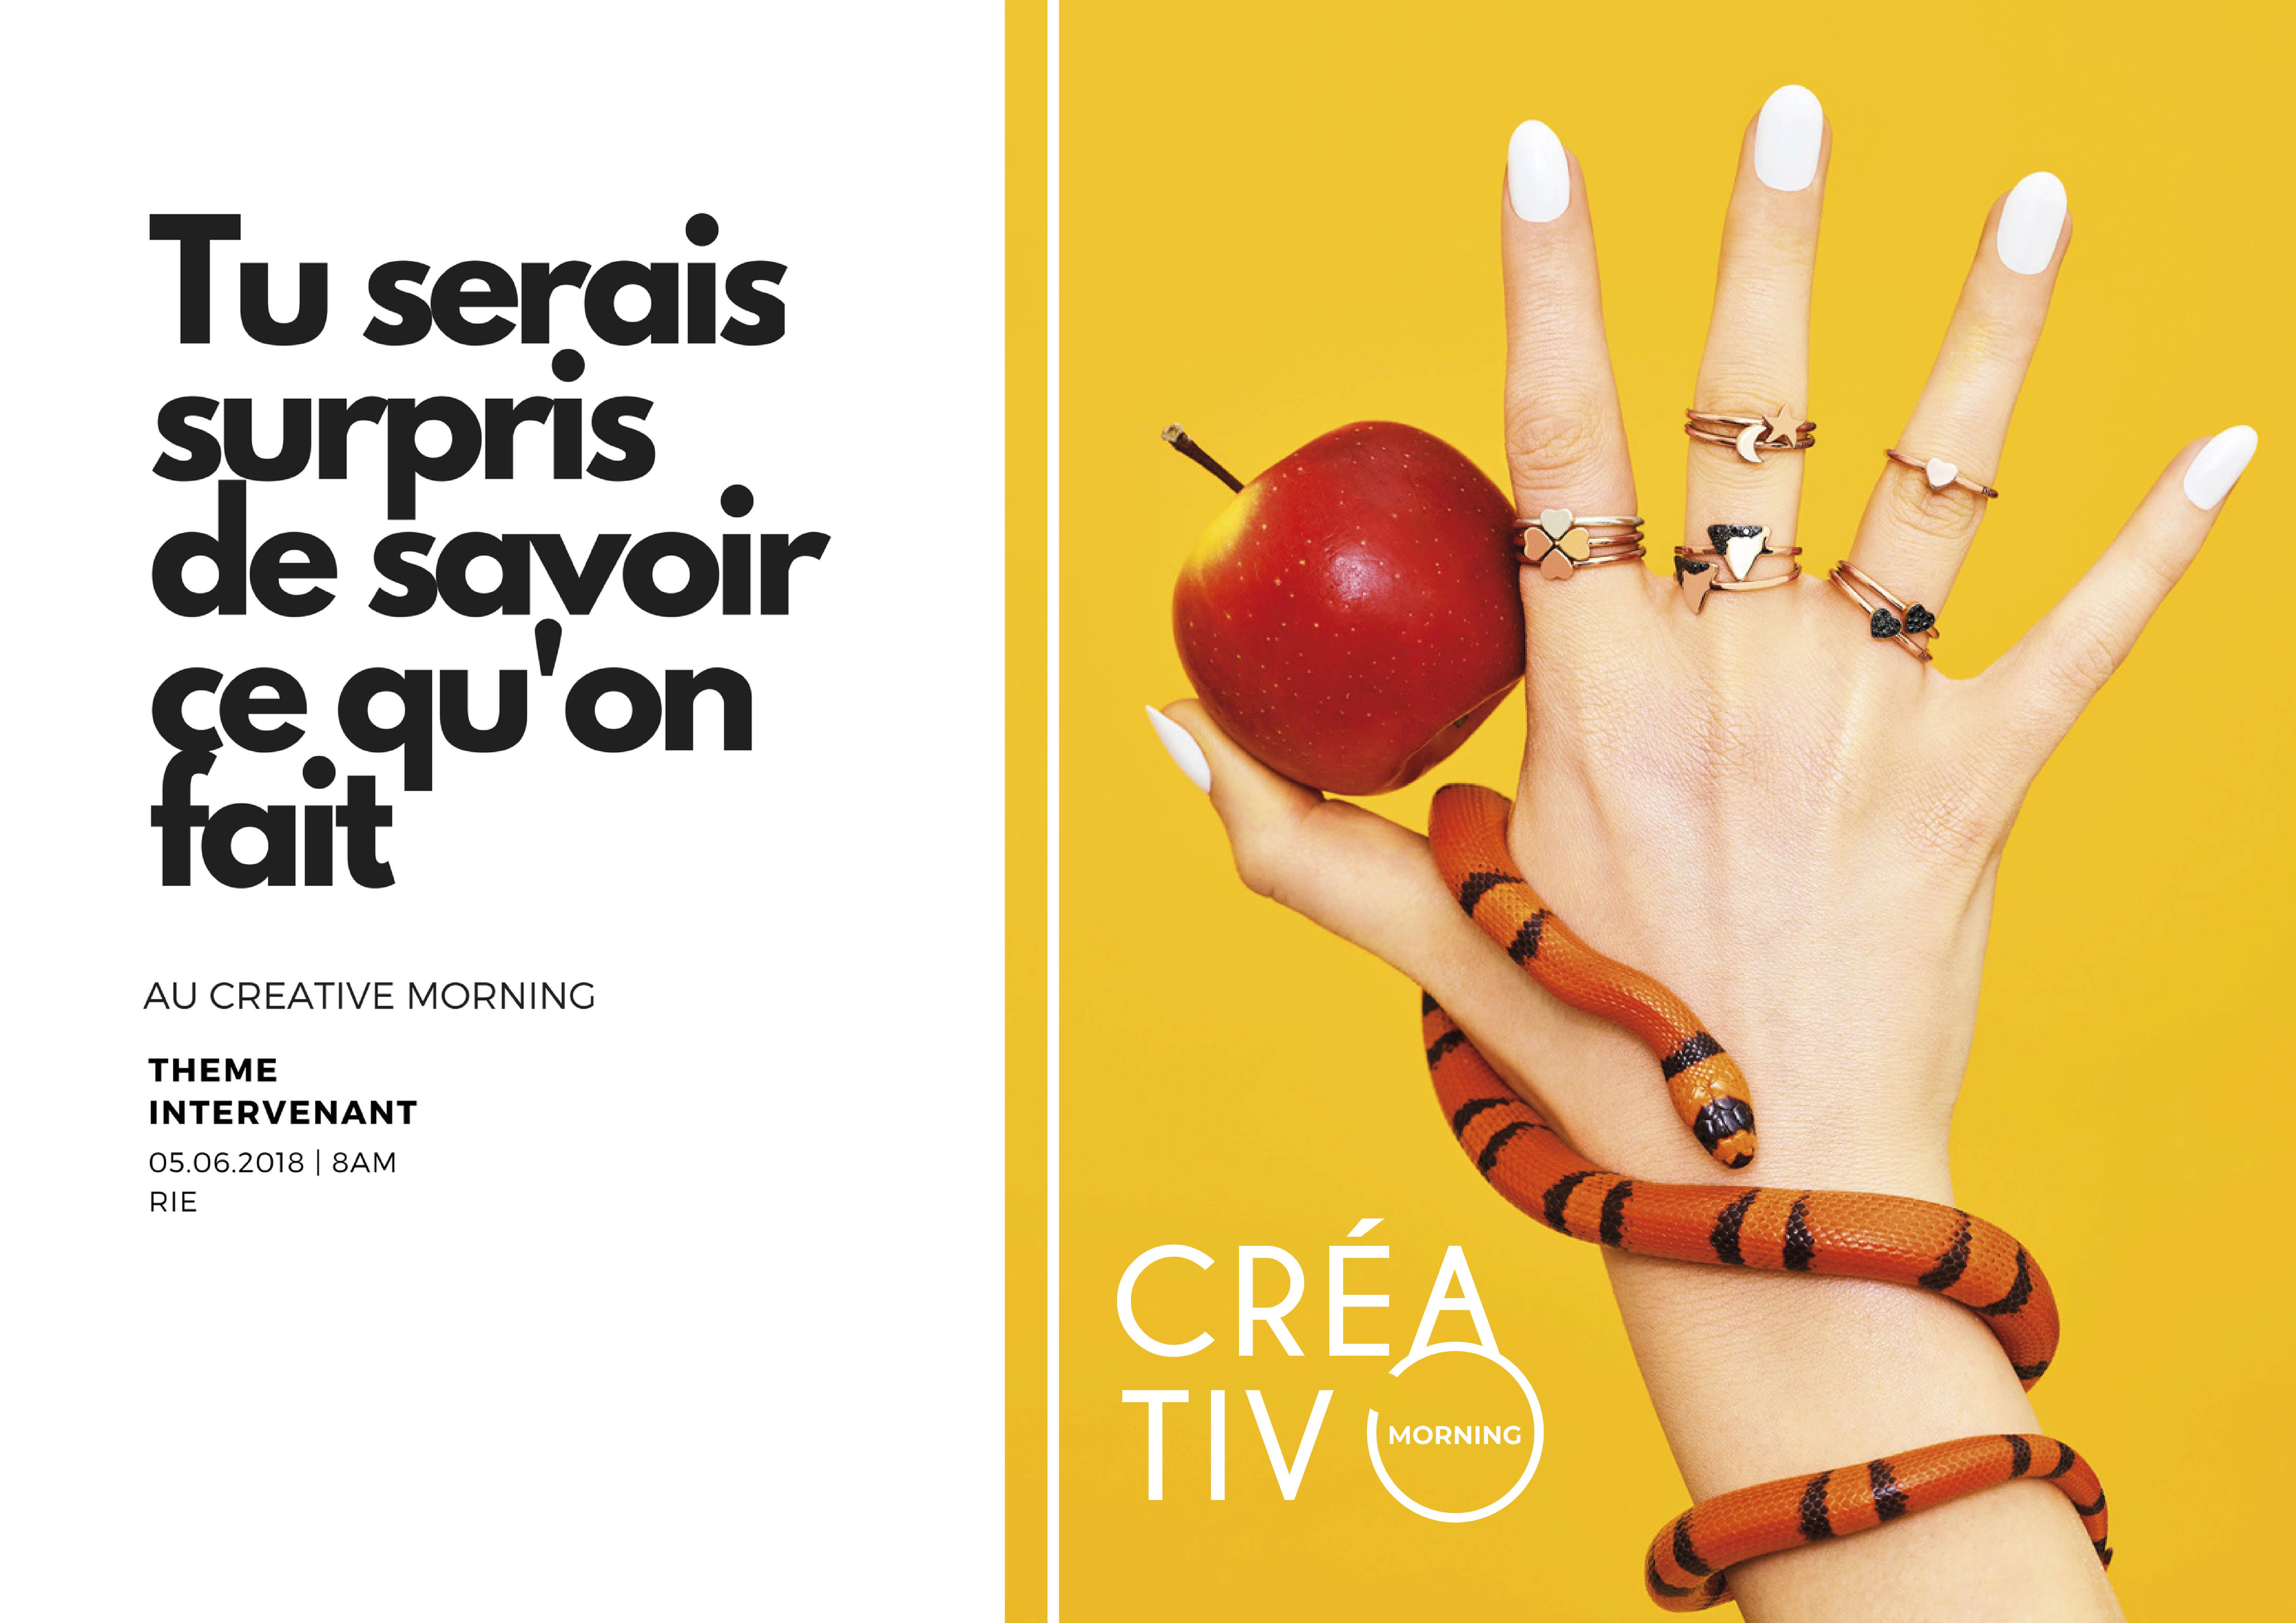 Creativ Morning6